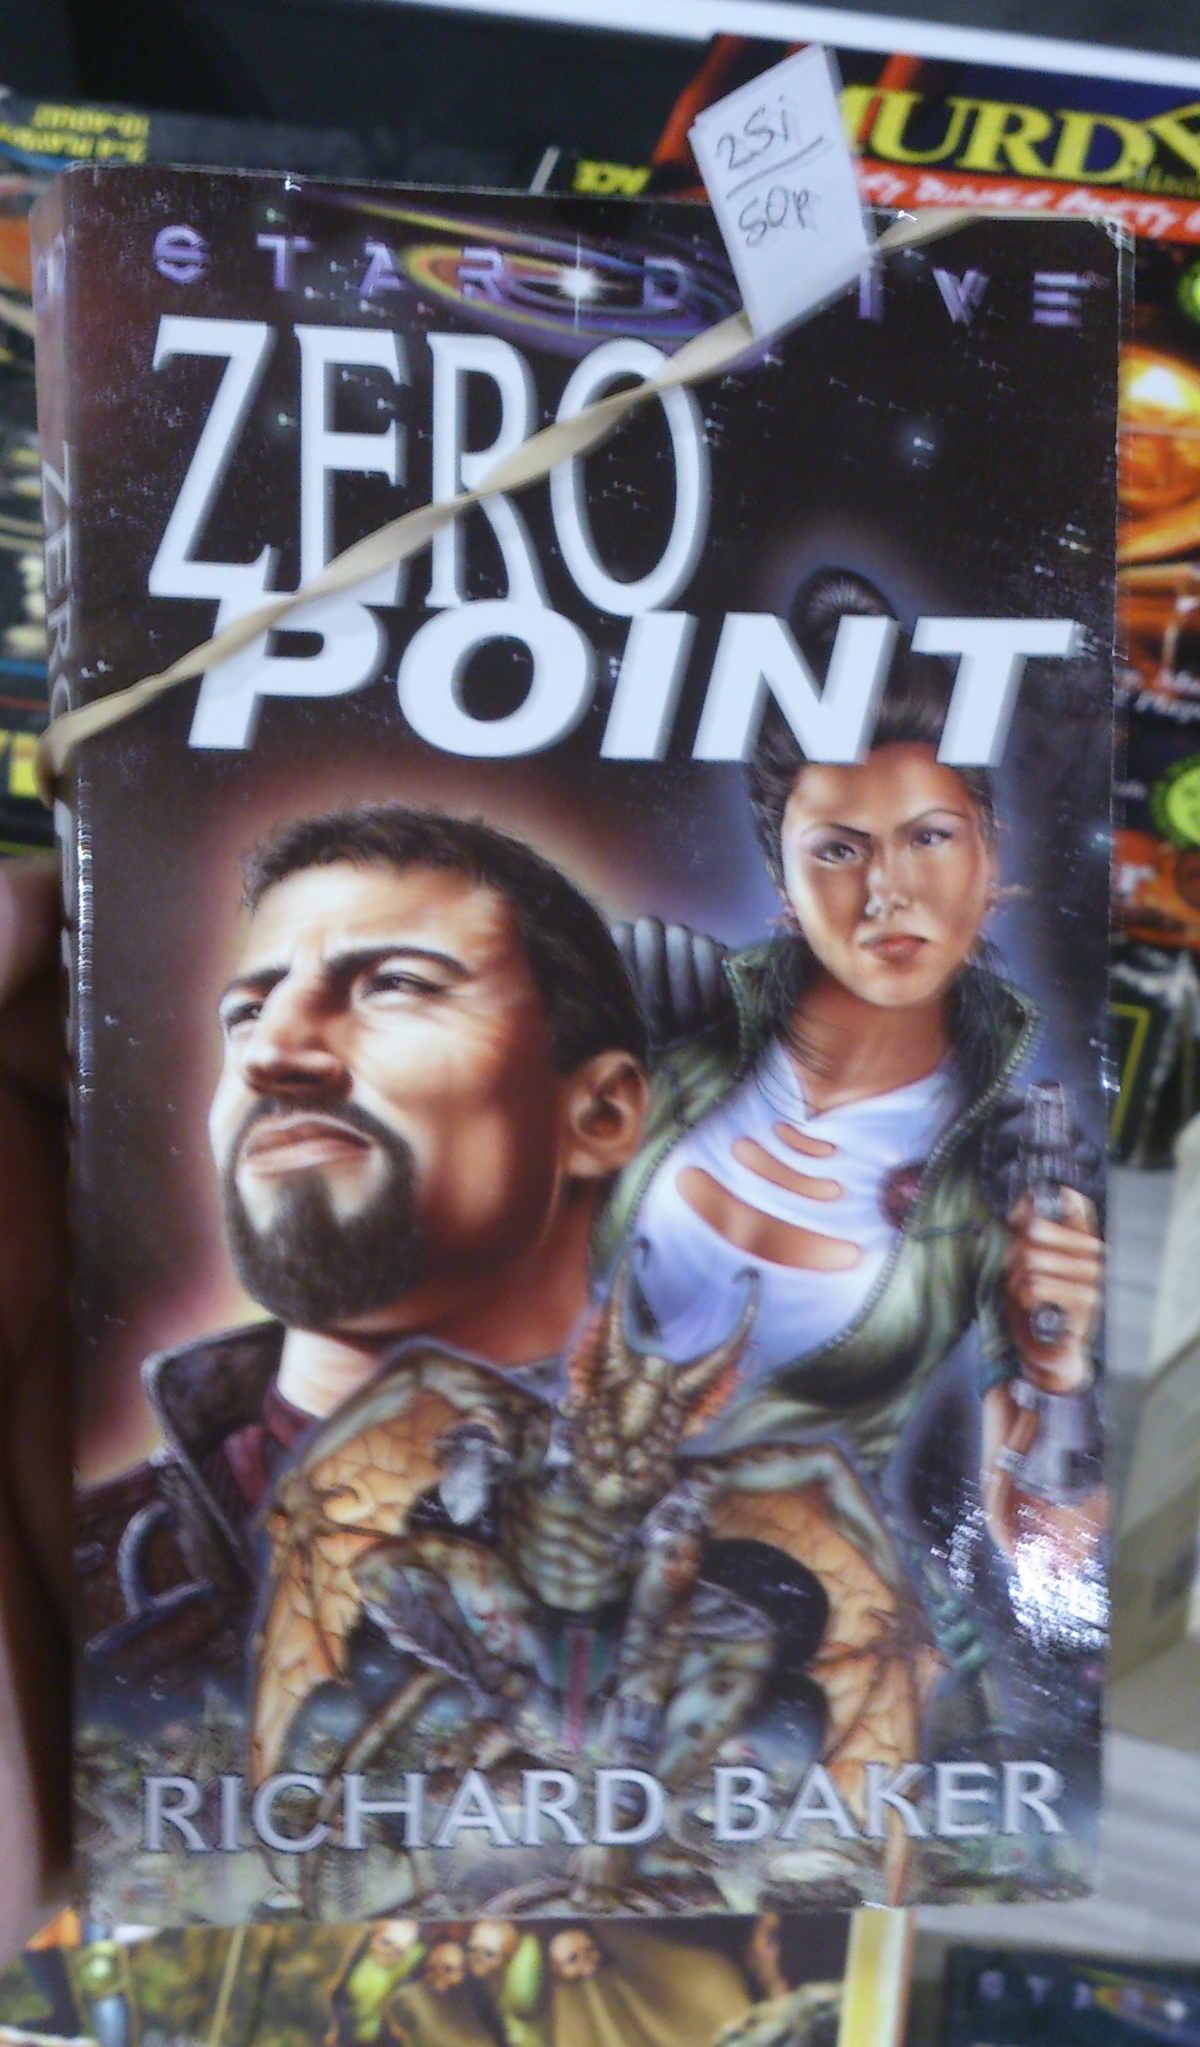 That's ok... I had ZERO interest... a ha ha ha...